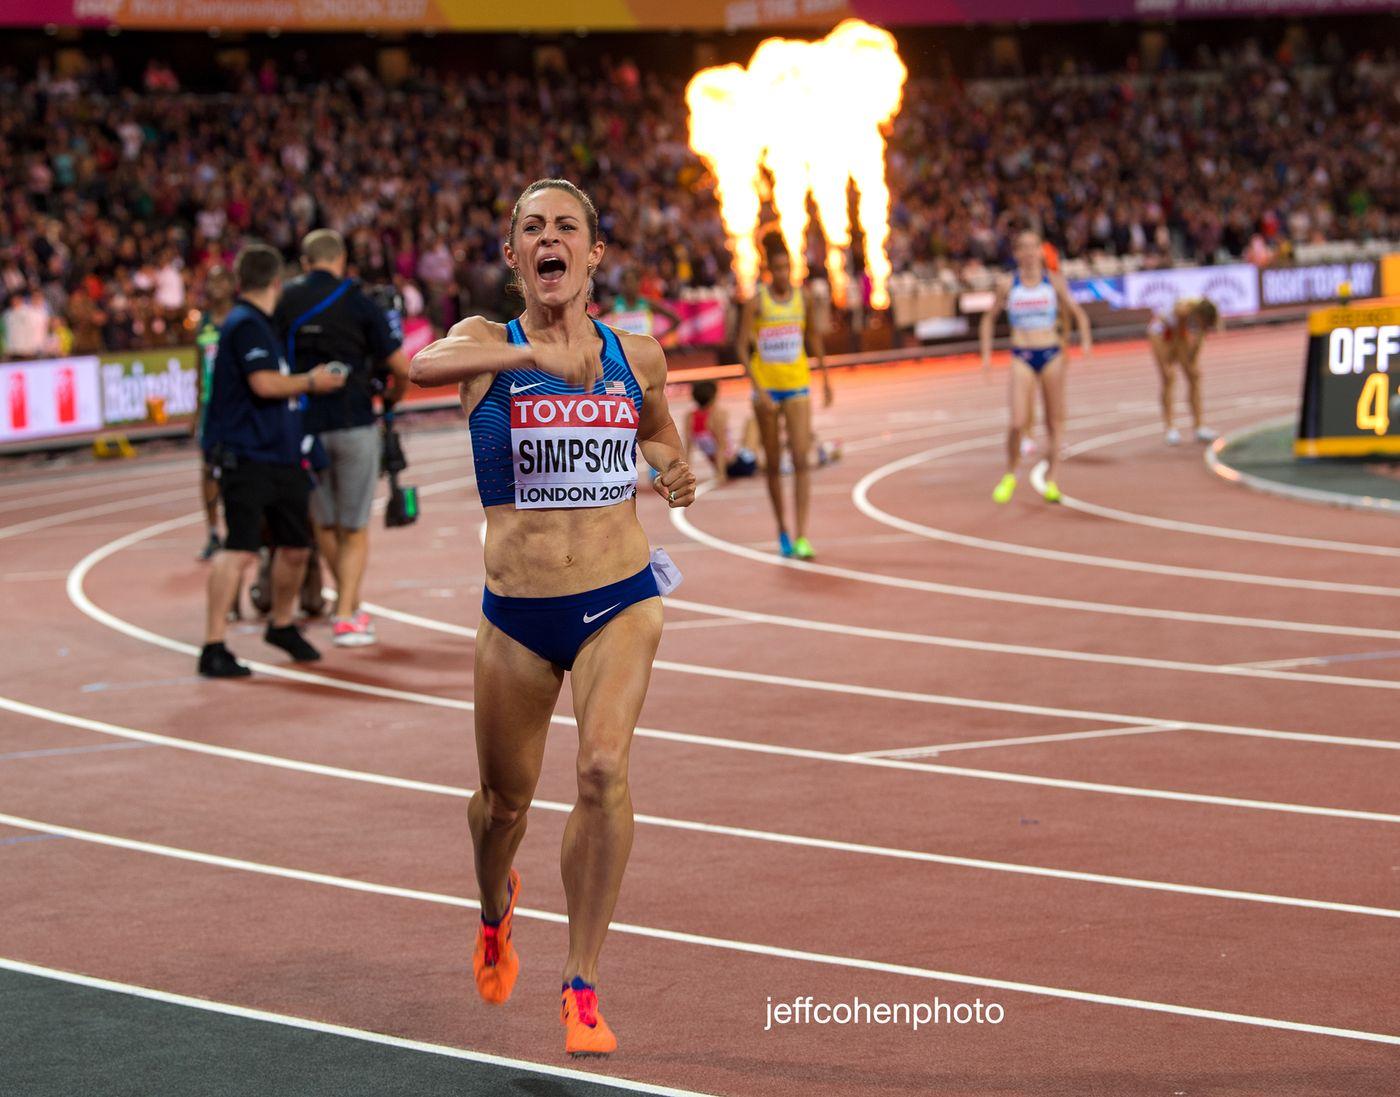 2017-IAAF-WC-London-night-4-simpson-1500w-jube-4810-jeff-cohen-photo---web.jpg